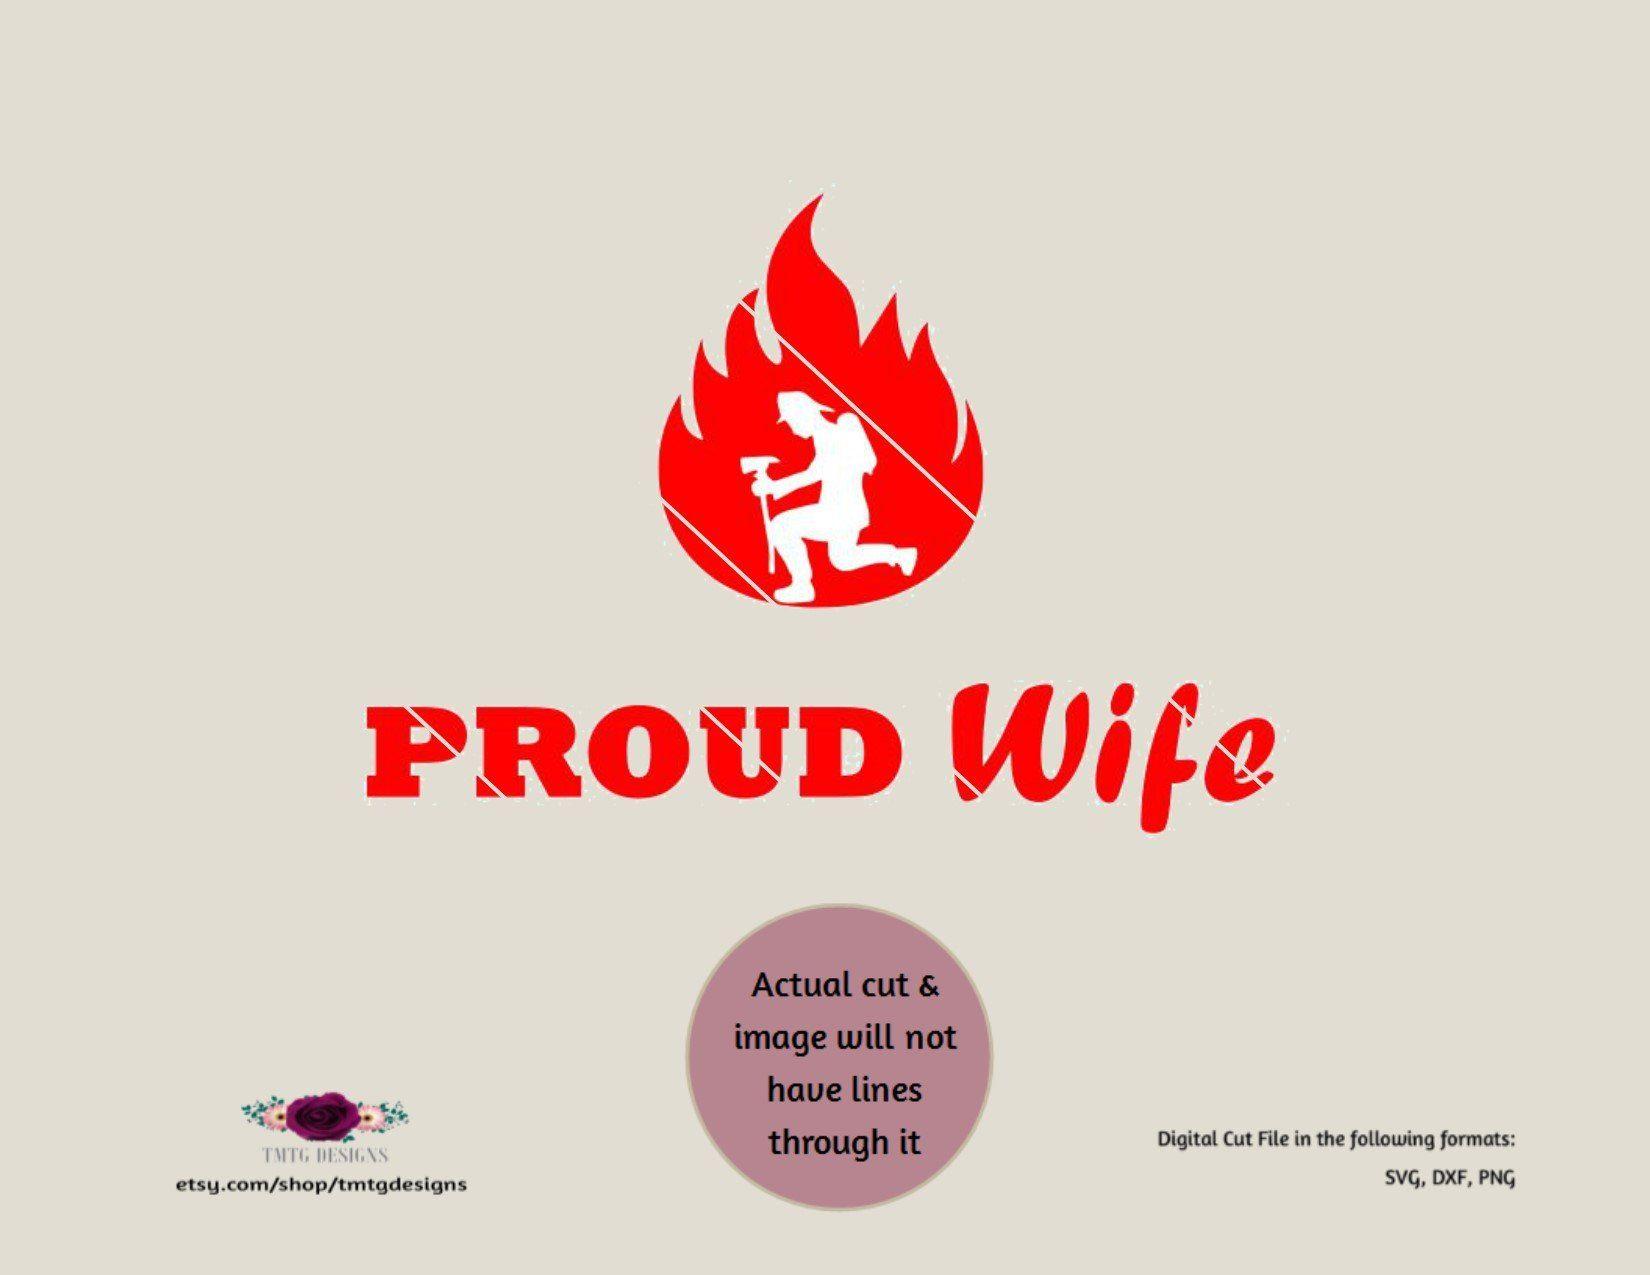 Firefighter Svg Firefighter Love Svg Proud Wife Firefighter Wife Svg Svg Dfx Cricut Download Files For Silh Firefighter Love Firefighter Wife Proud Wife